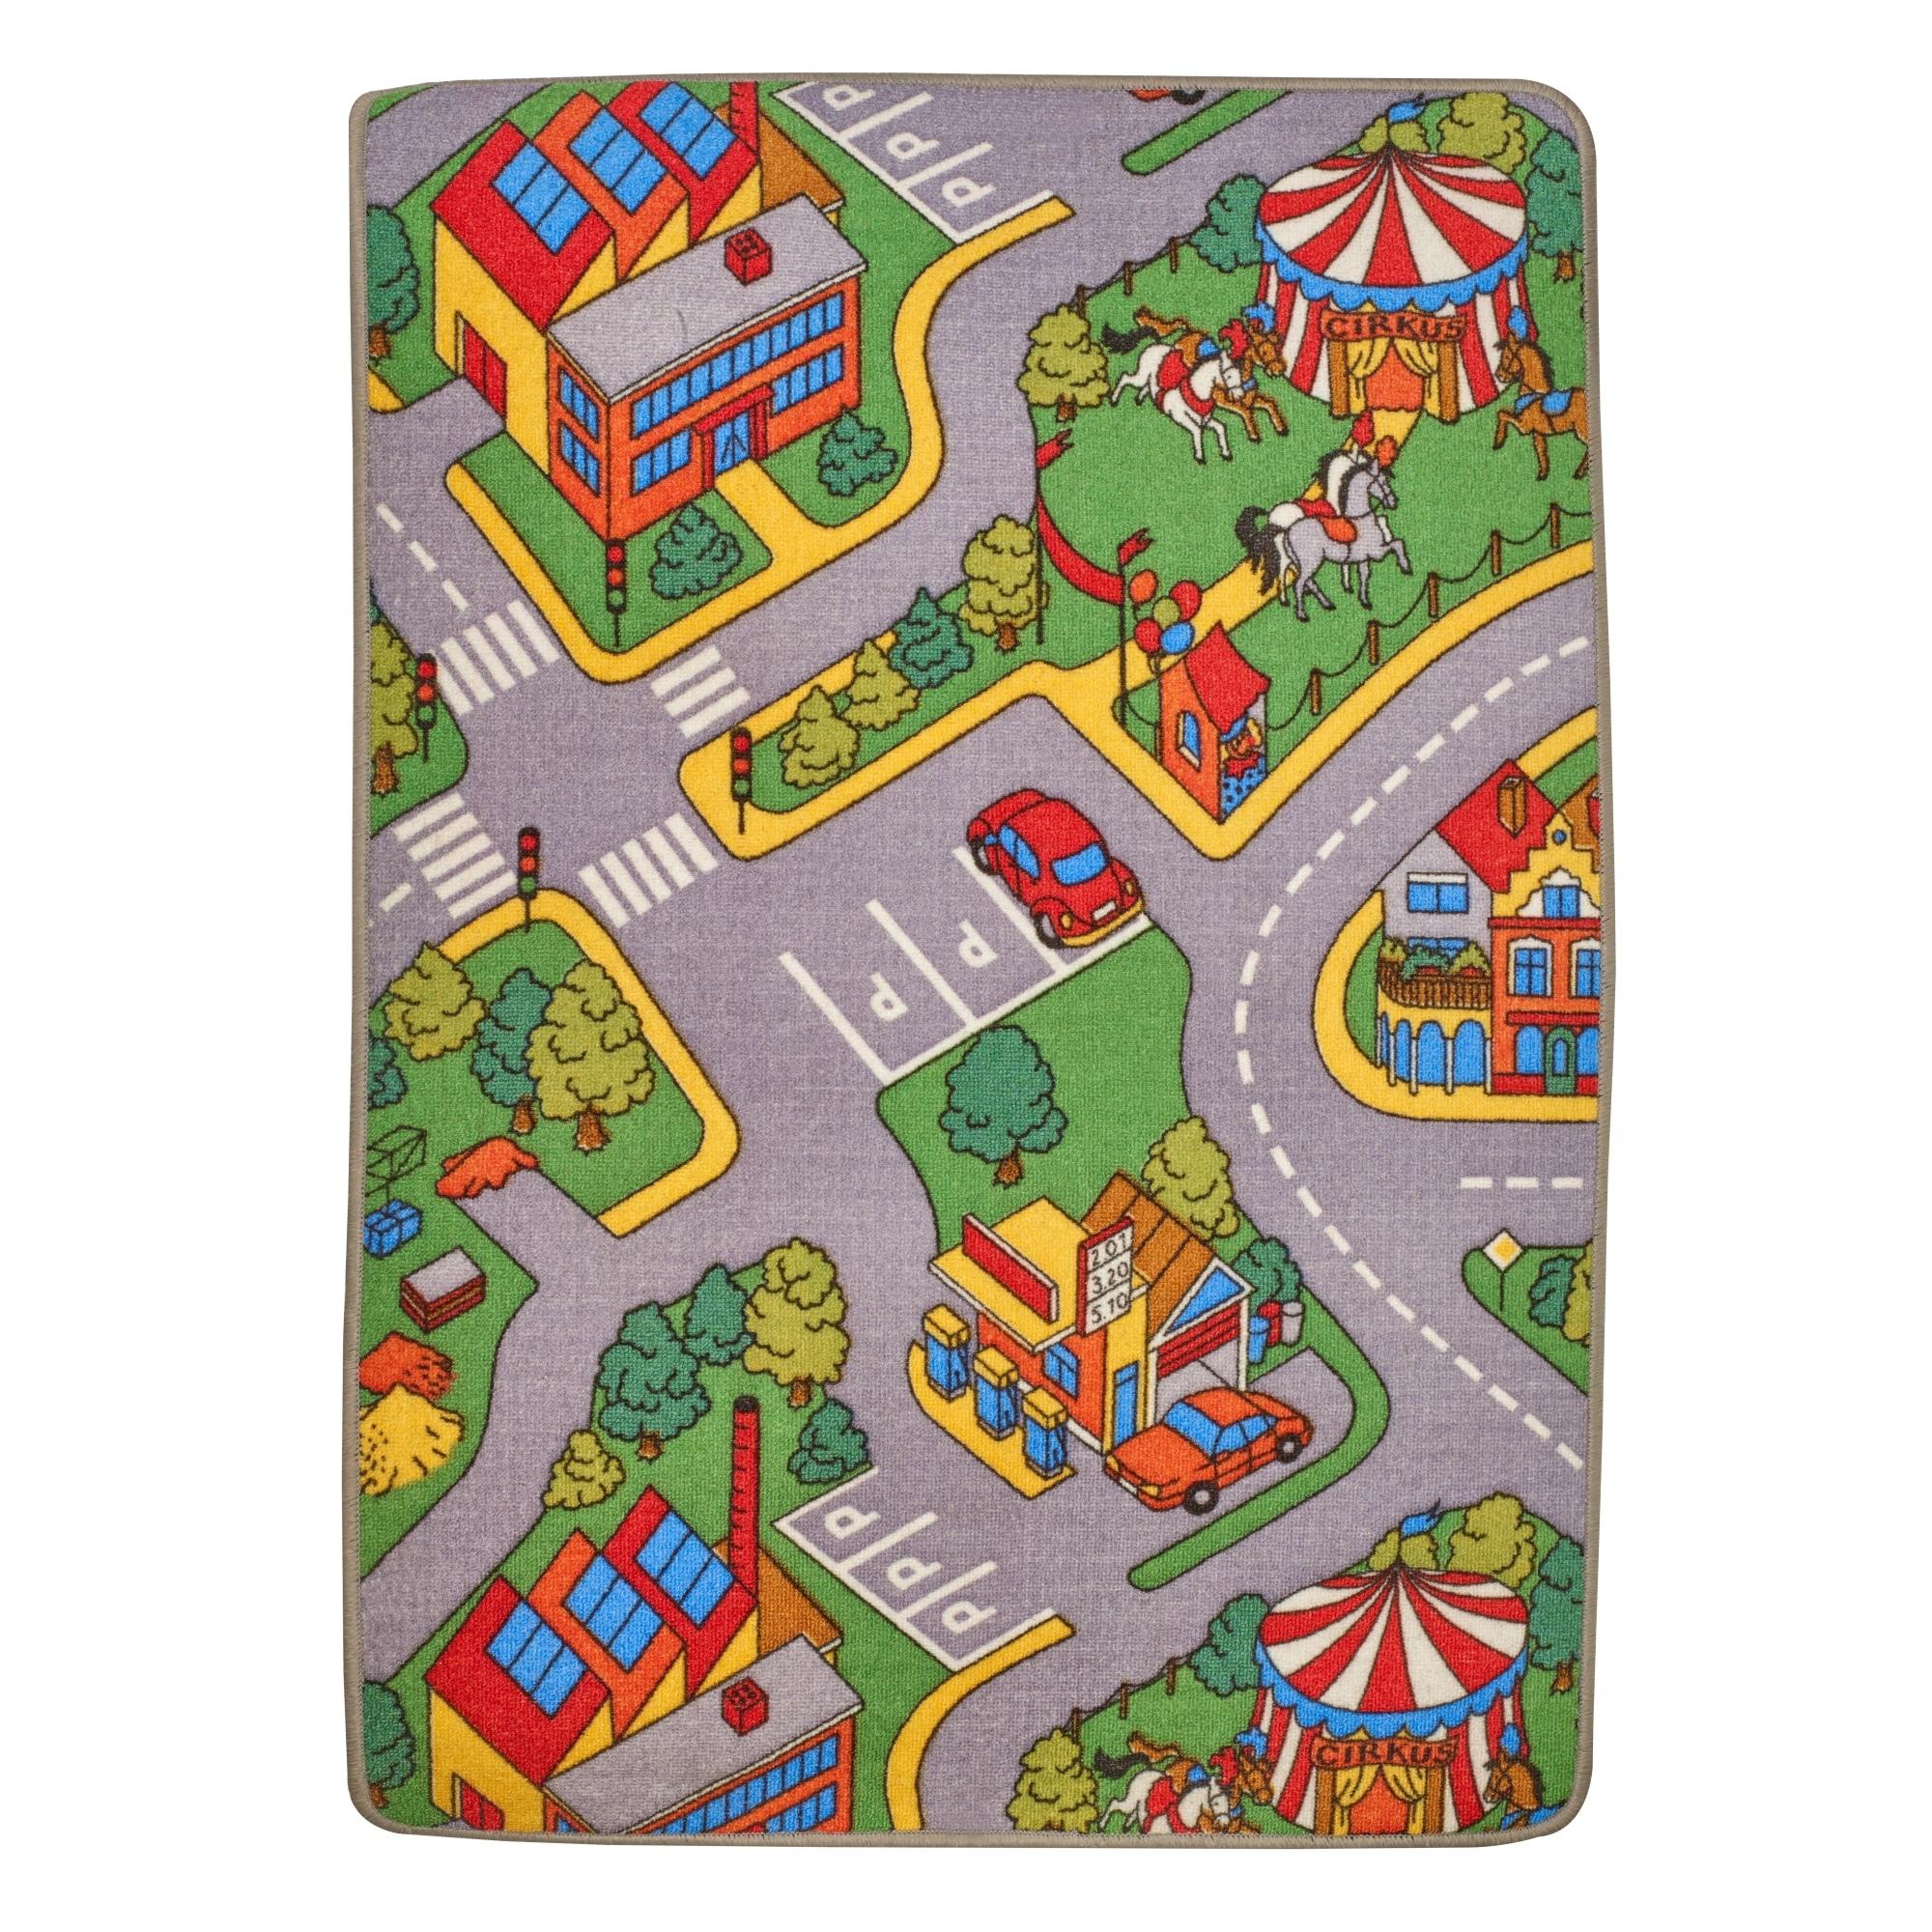 Large Kids Car Play Mat 120 X 80cm Town Village Children's